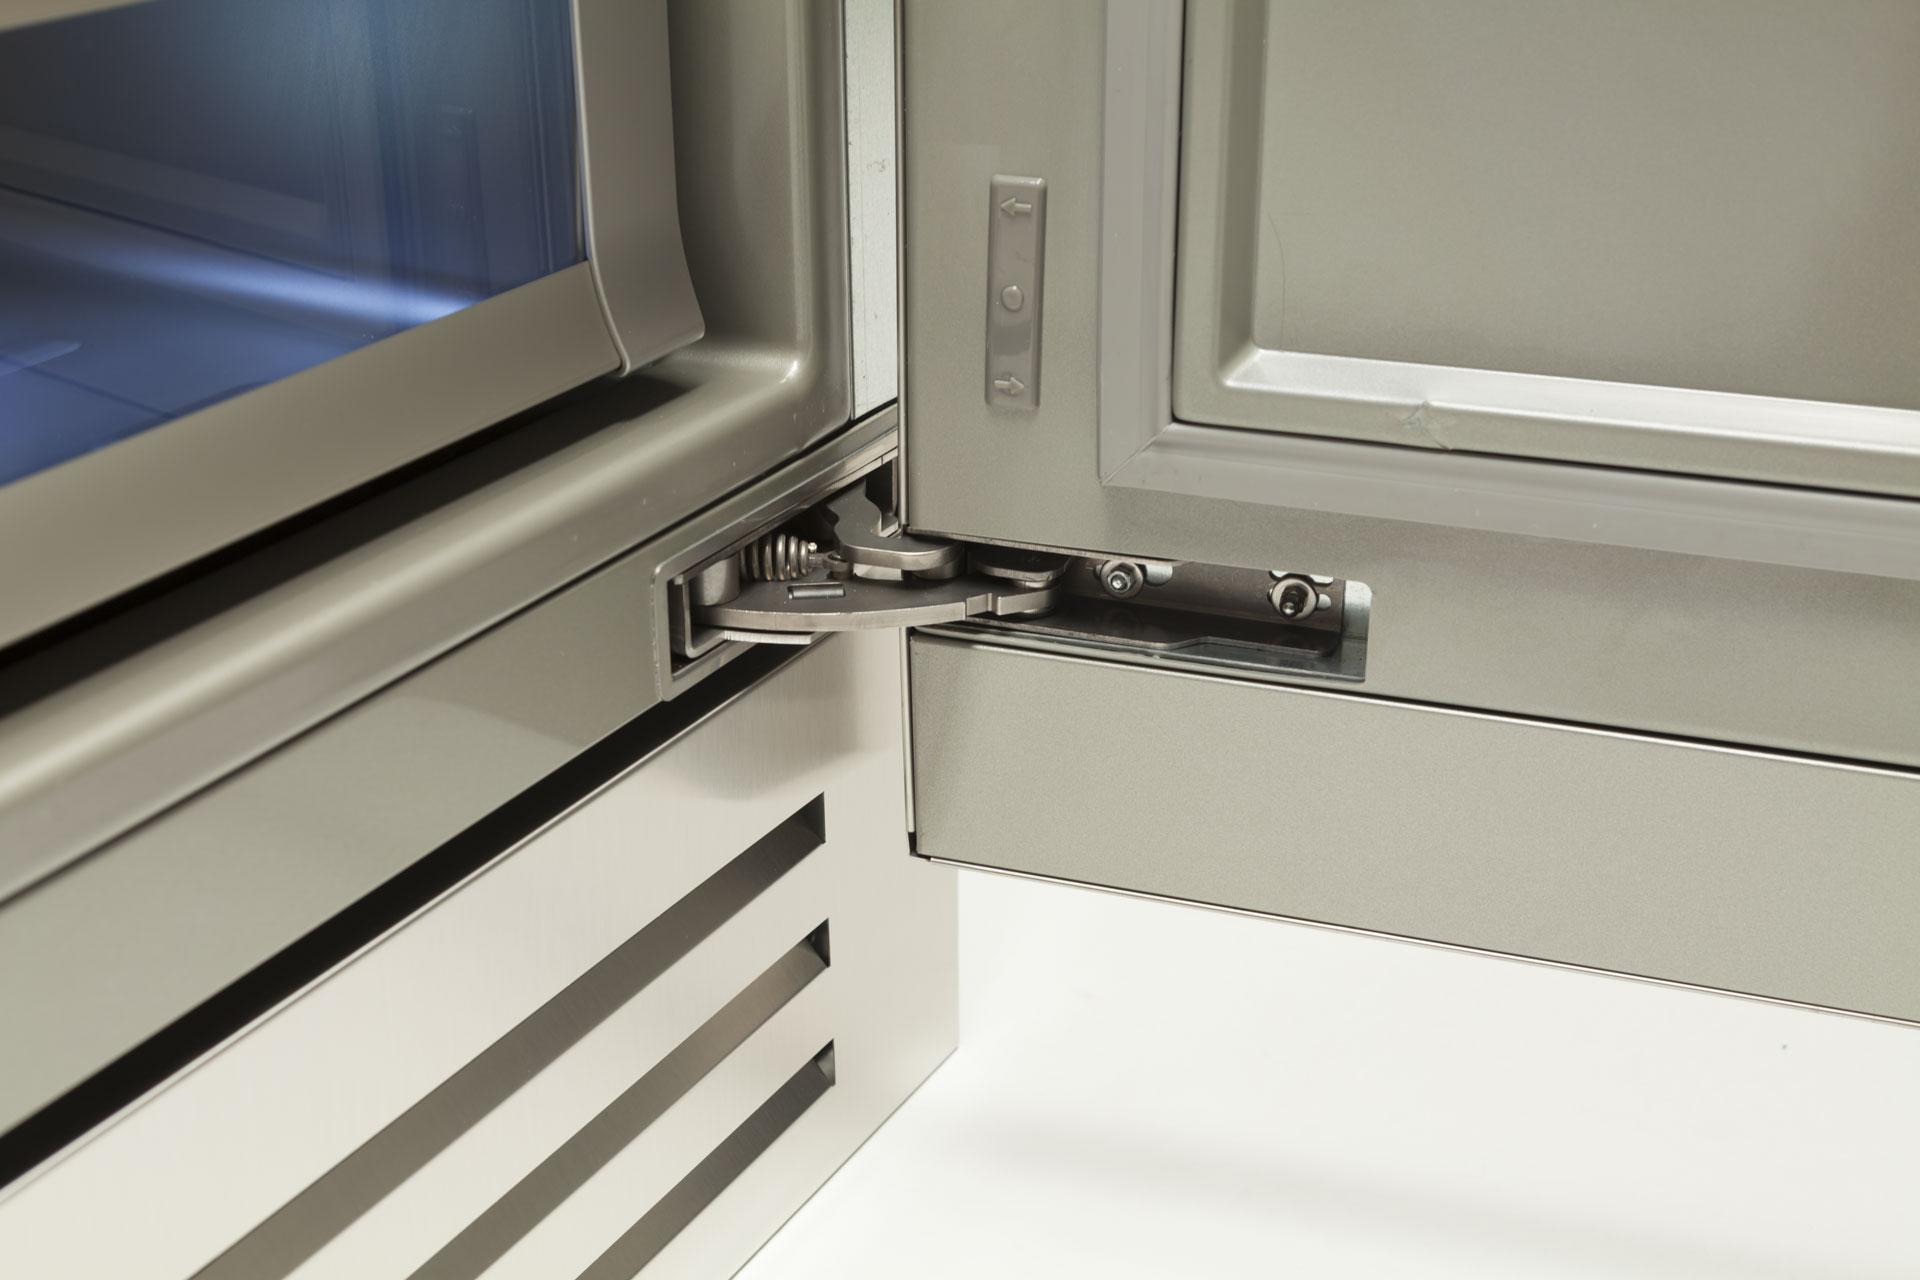 réfrigérateur Fhiaba